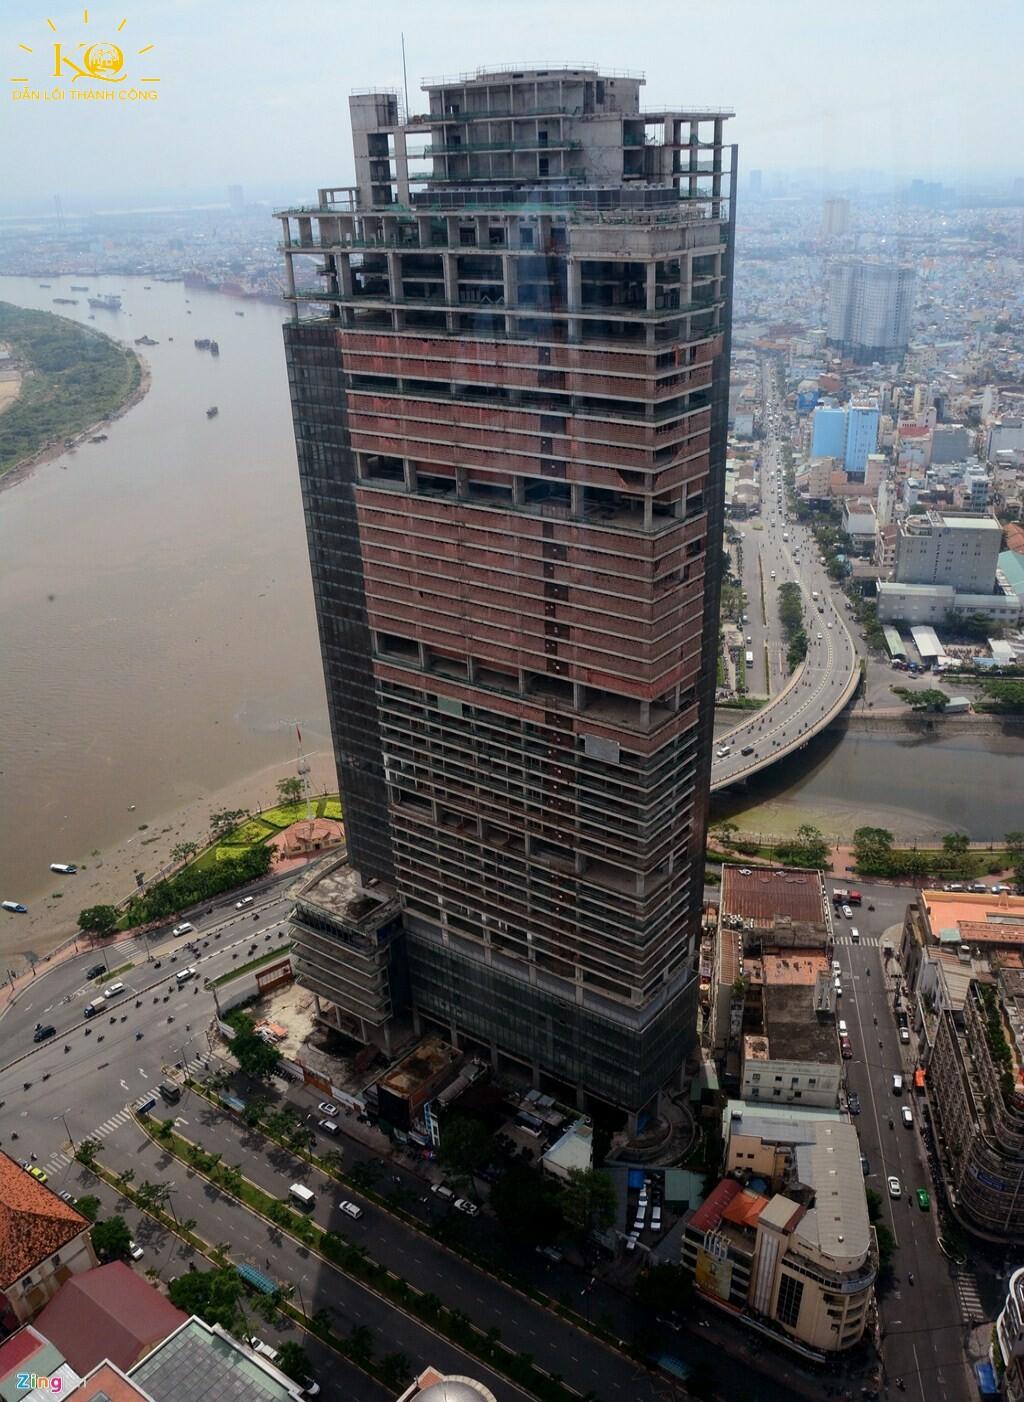 cho-thue-van-phong-hang-a-saigon-one-tower-1-hinh-bao-quat-toa-nha-dia-oc-kim-quang